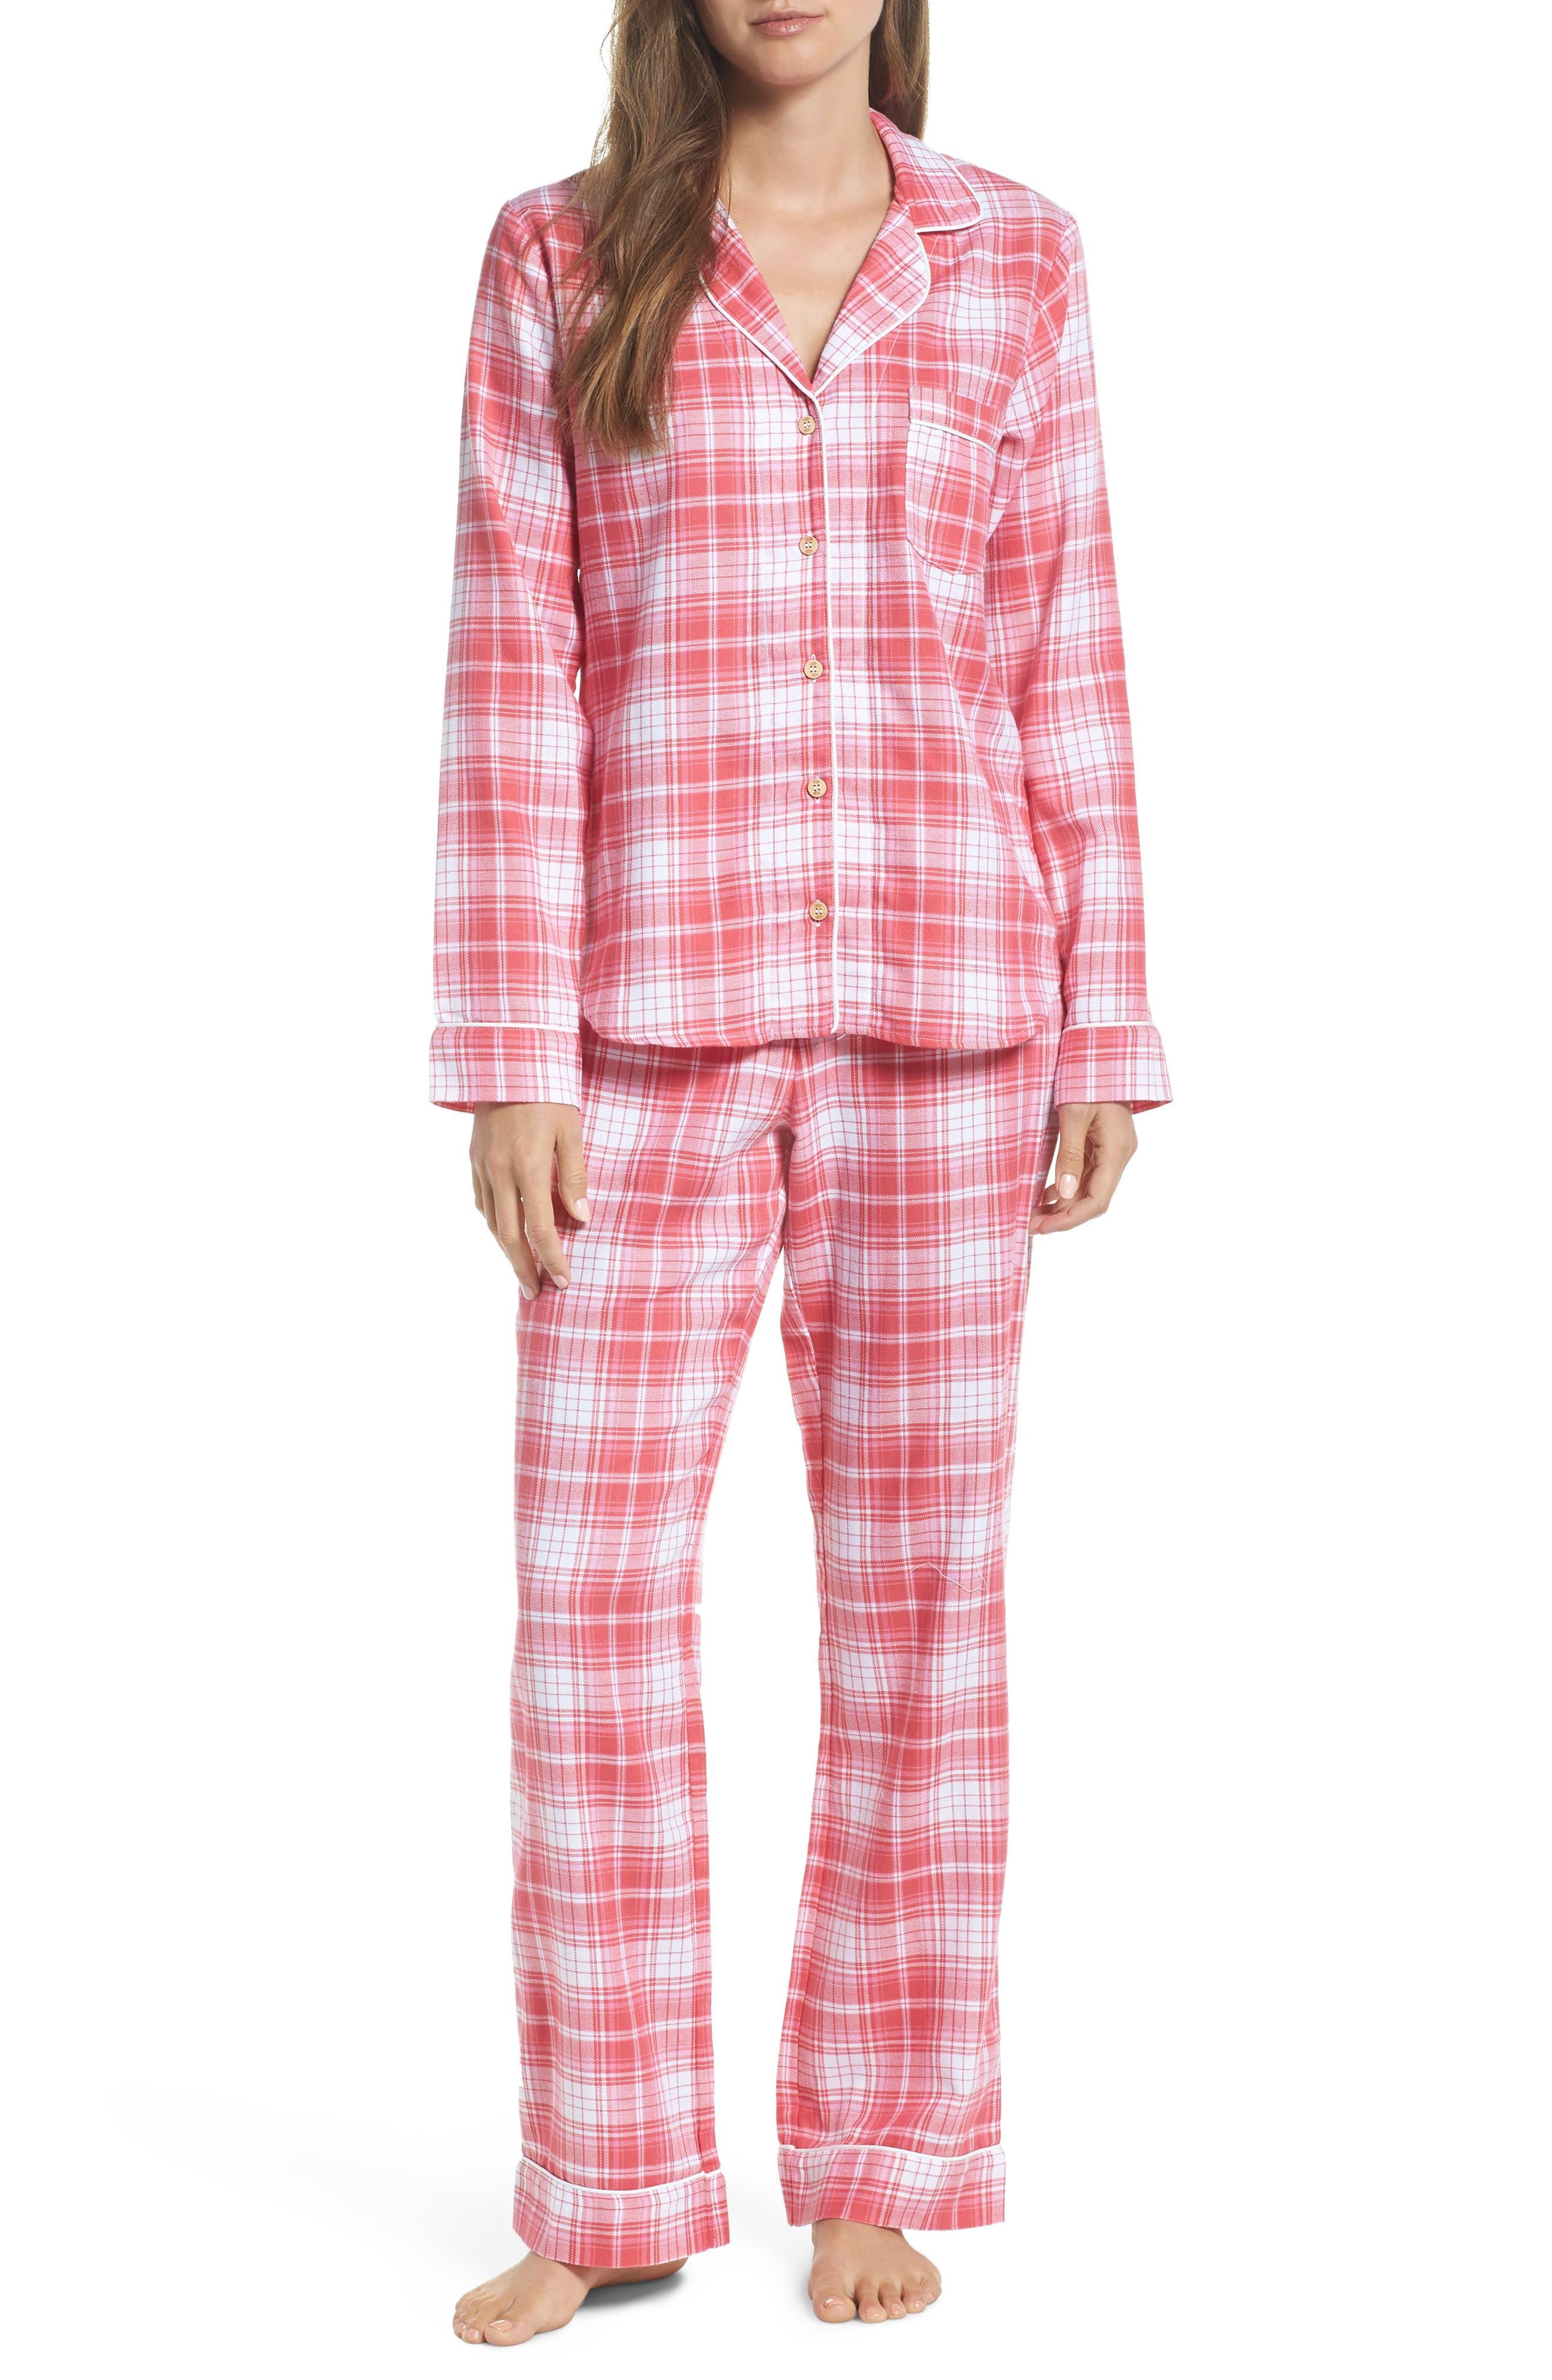 Raven Plaid Pajamas,                             Main thumbnail 1, color,                             CLARET RED PLAID